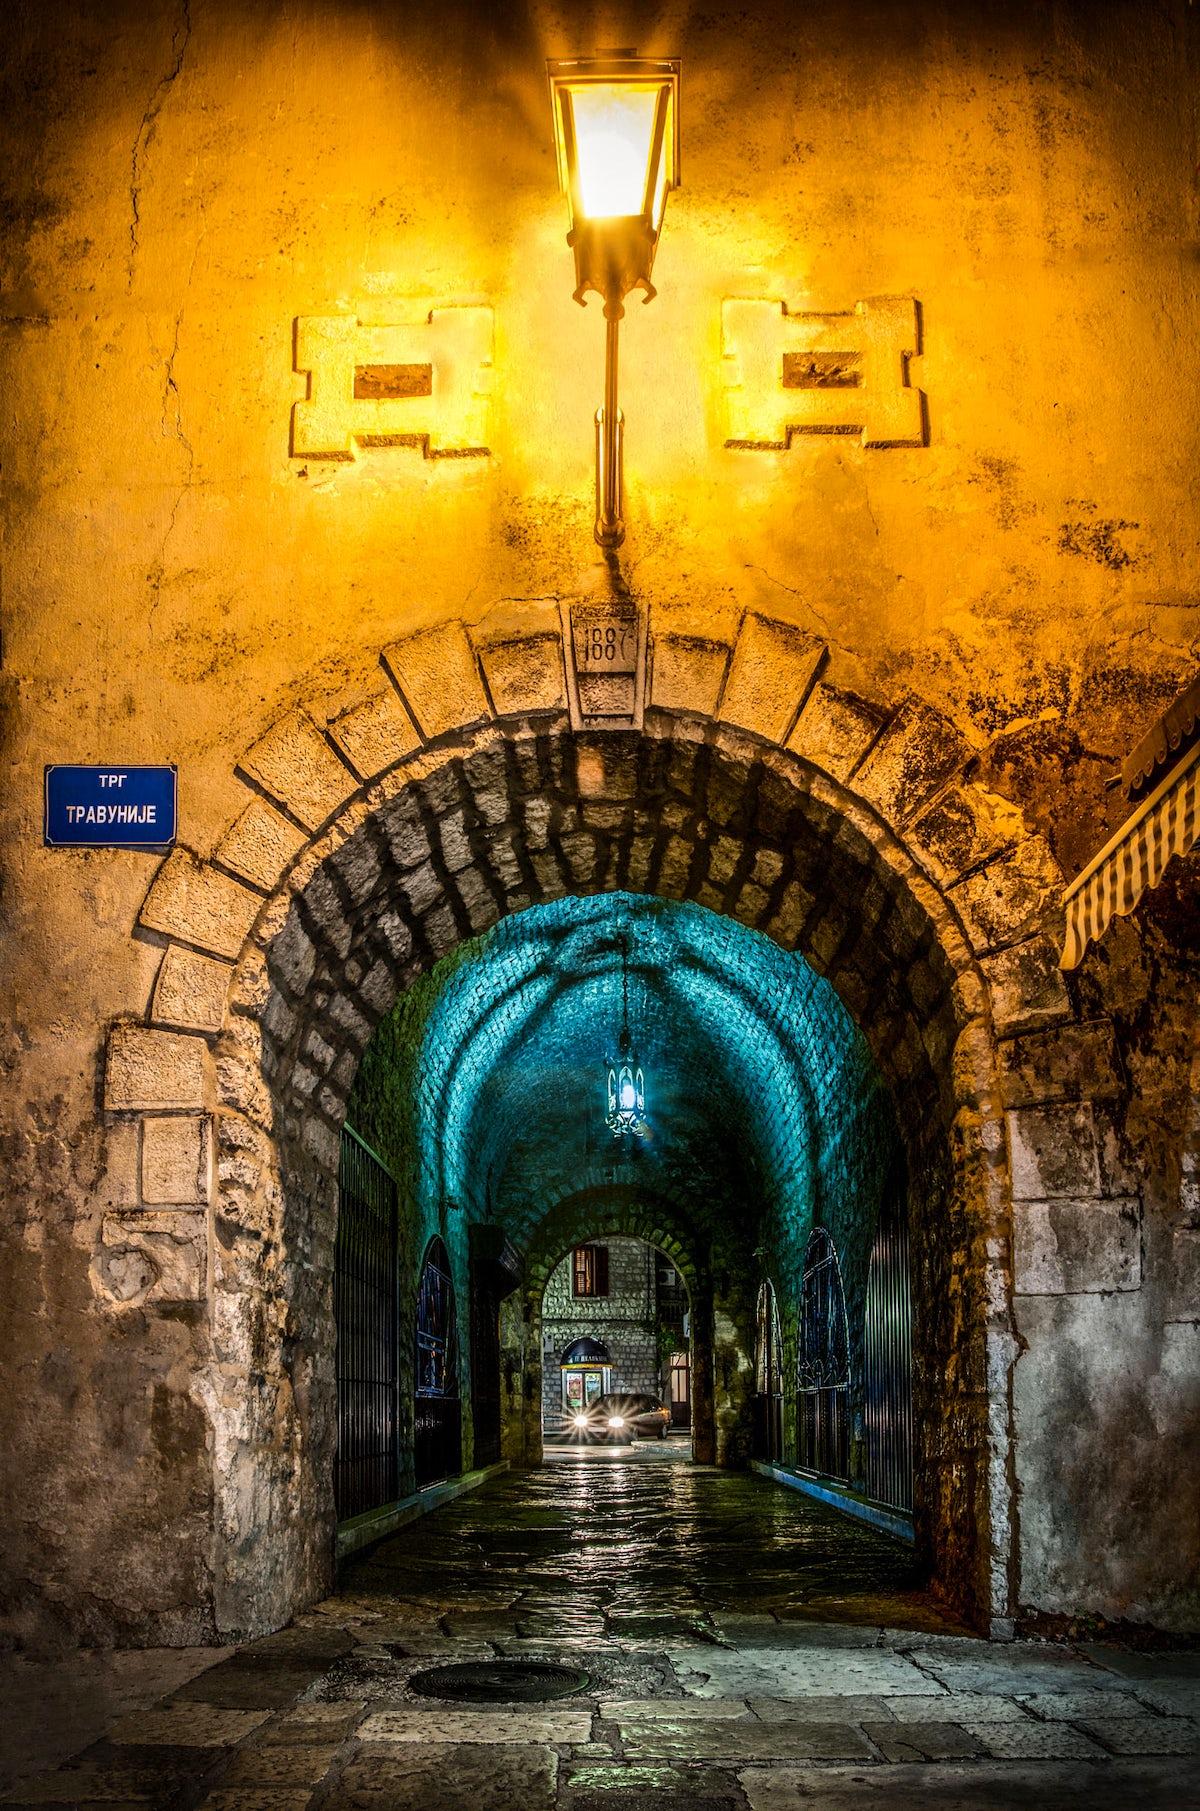 Trebinje for history lovers